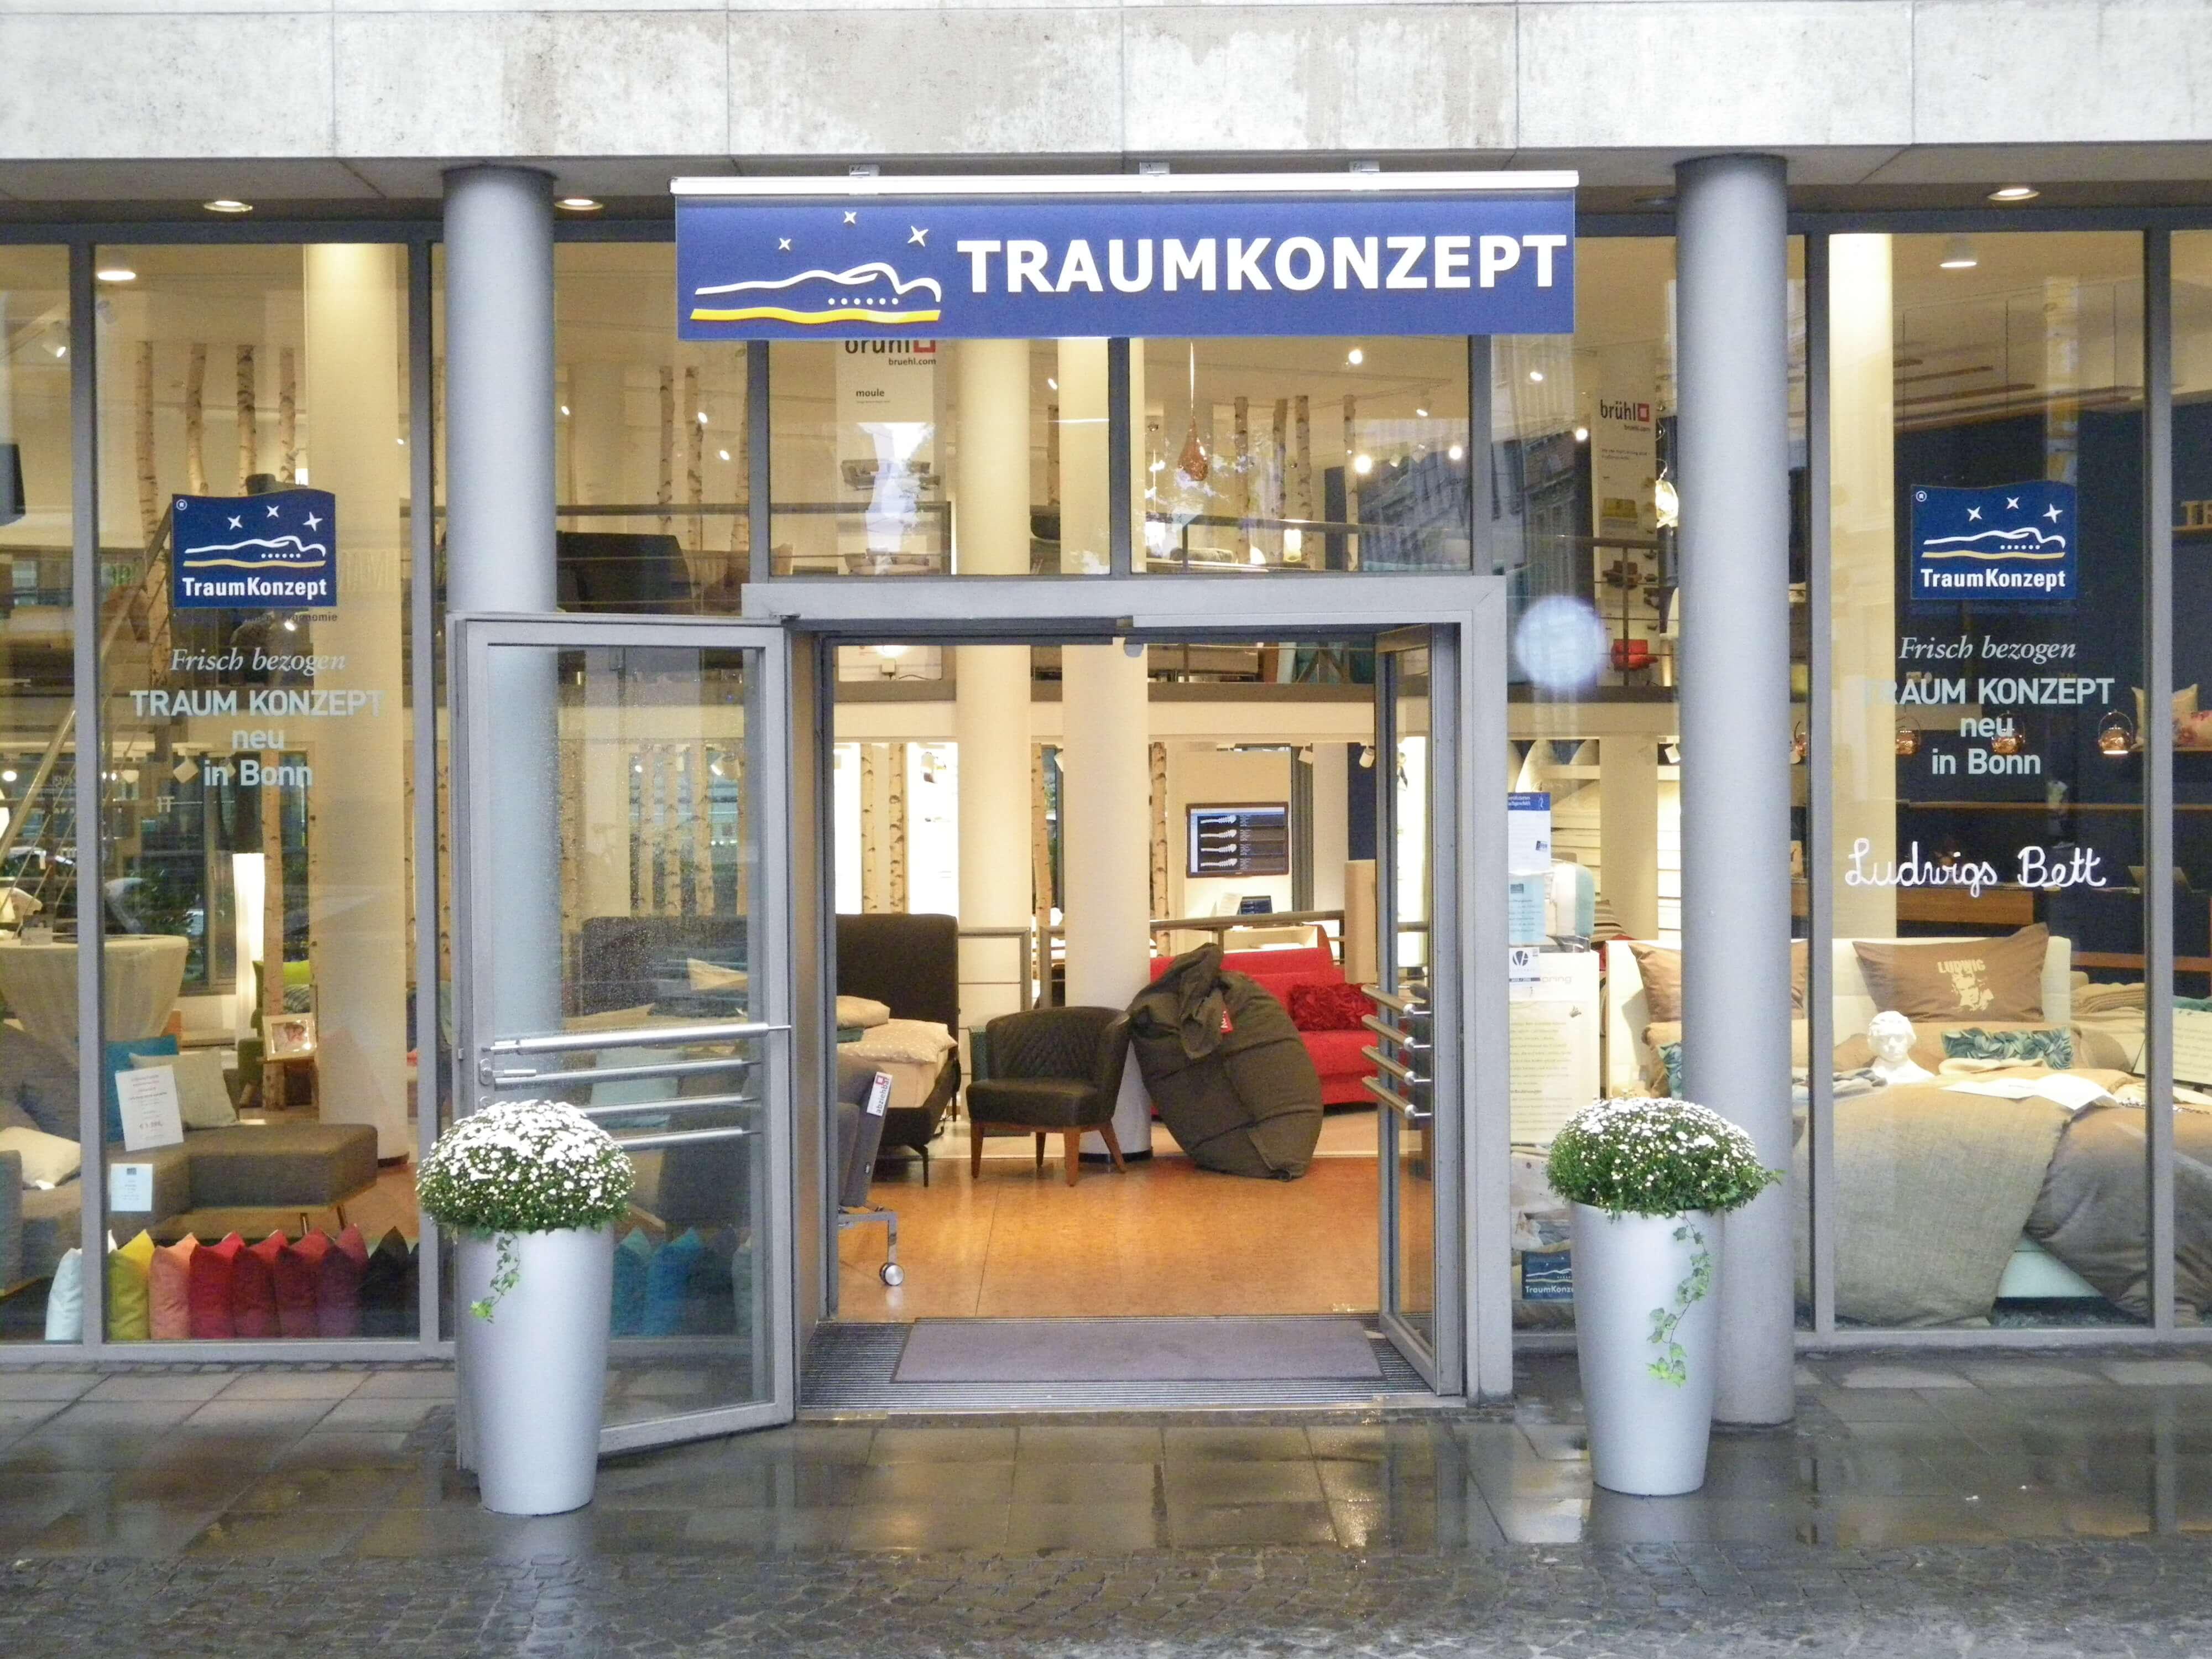 Traumkonzept Showroom Bonn